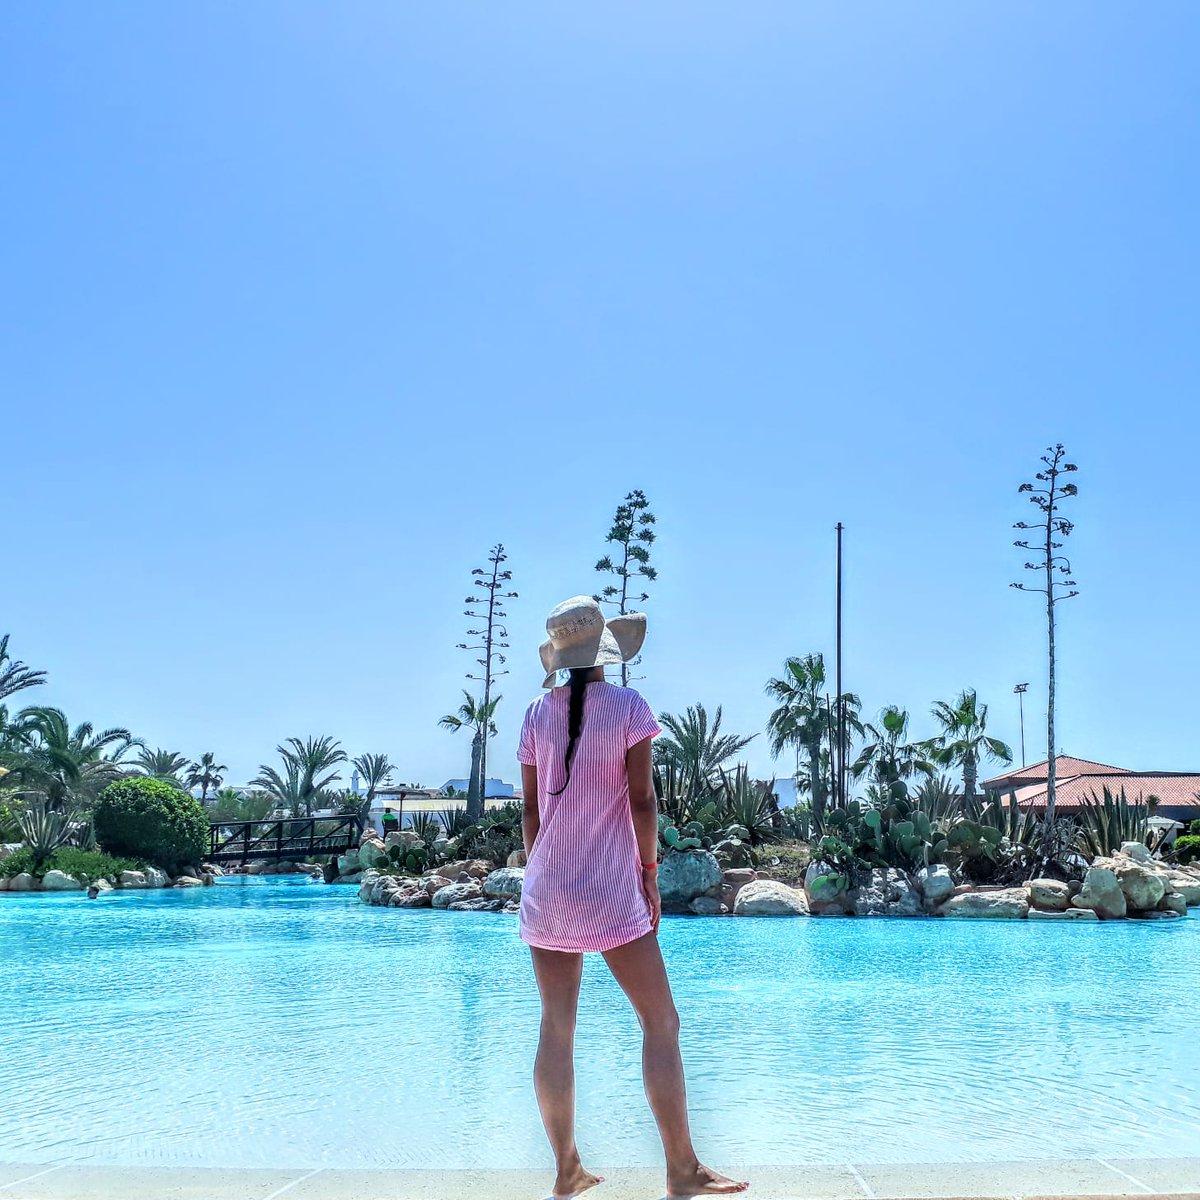 vacances au maroc 8:41 AM - 6 Oct 2018